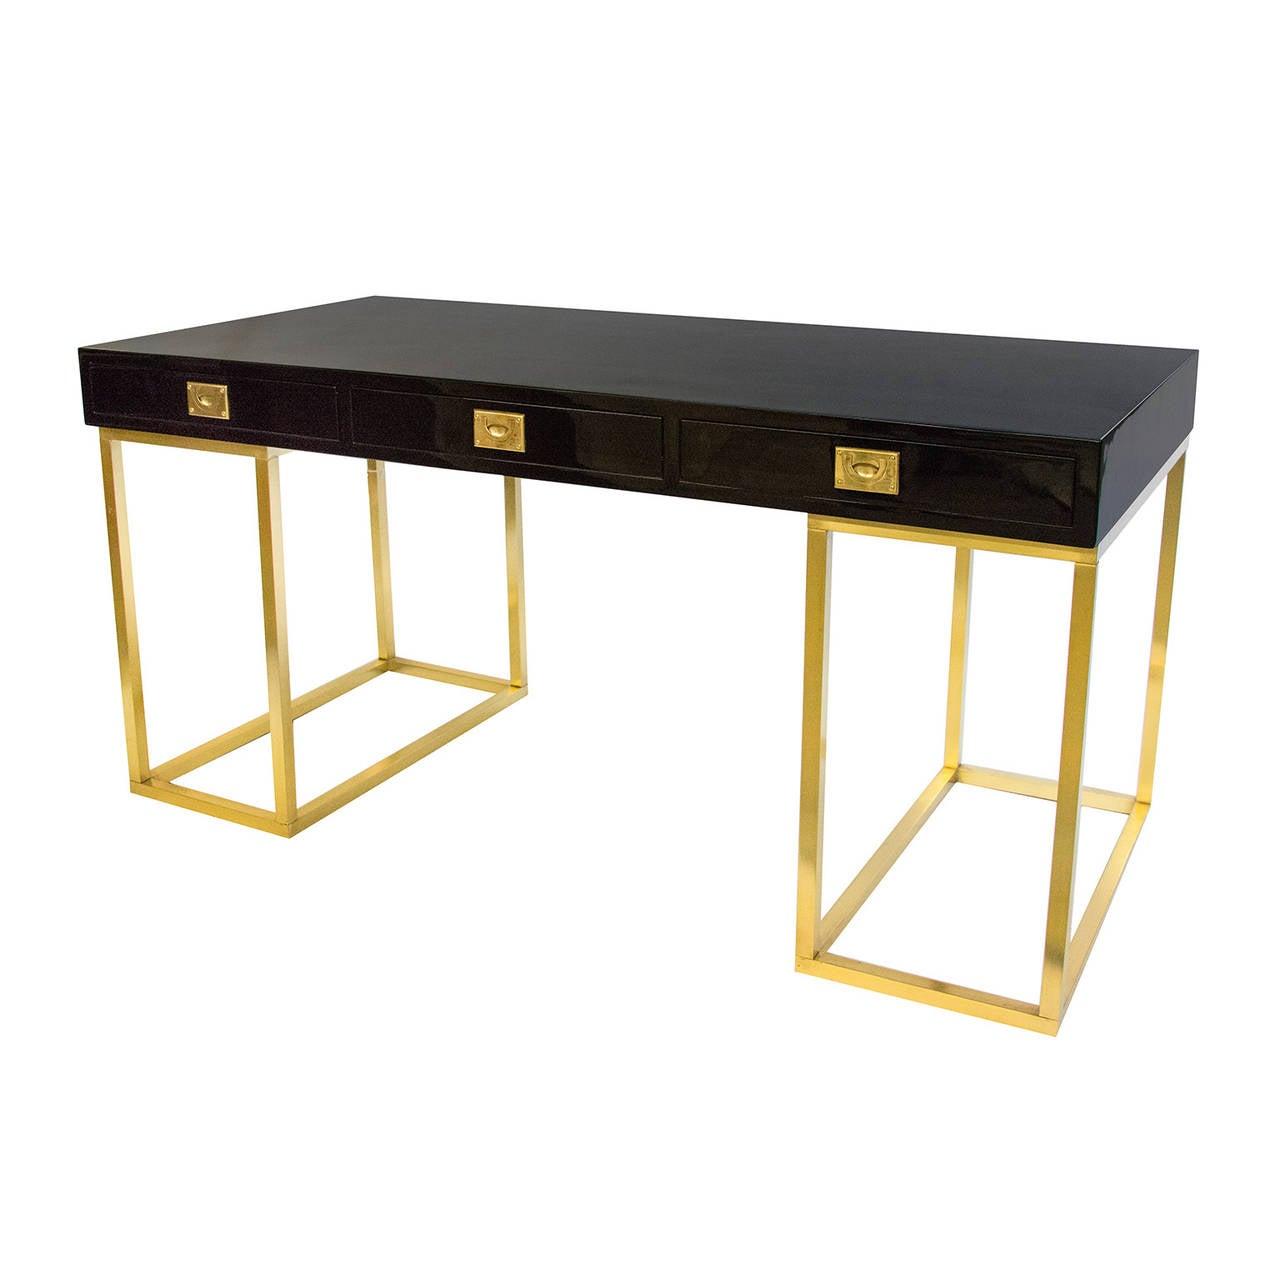 Very rare black lacquer desk on a brass pedestal by Guy Lefevre for Maison Jansen, circa 1970s.